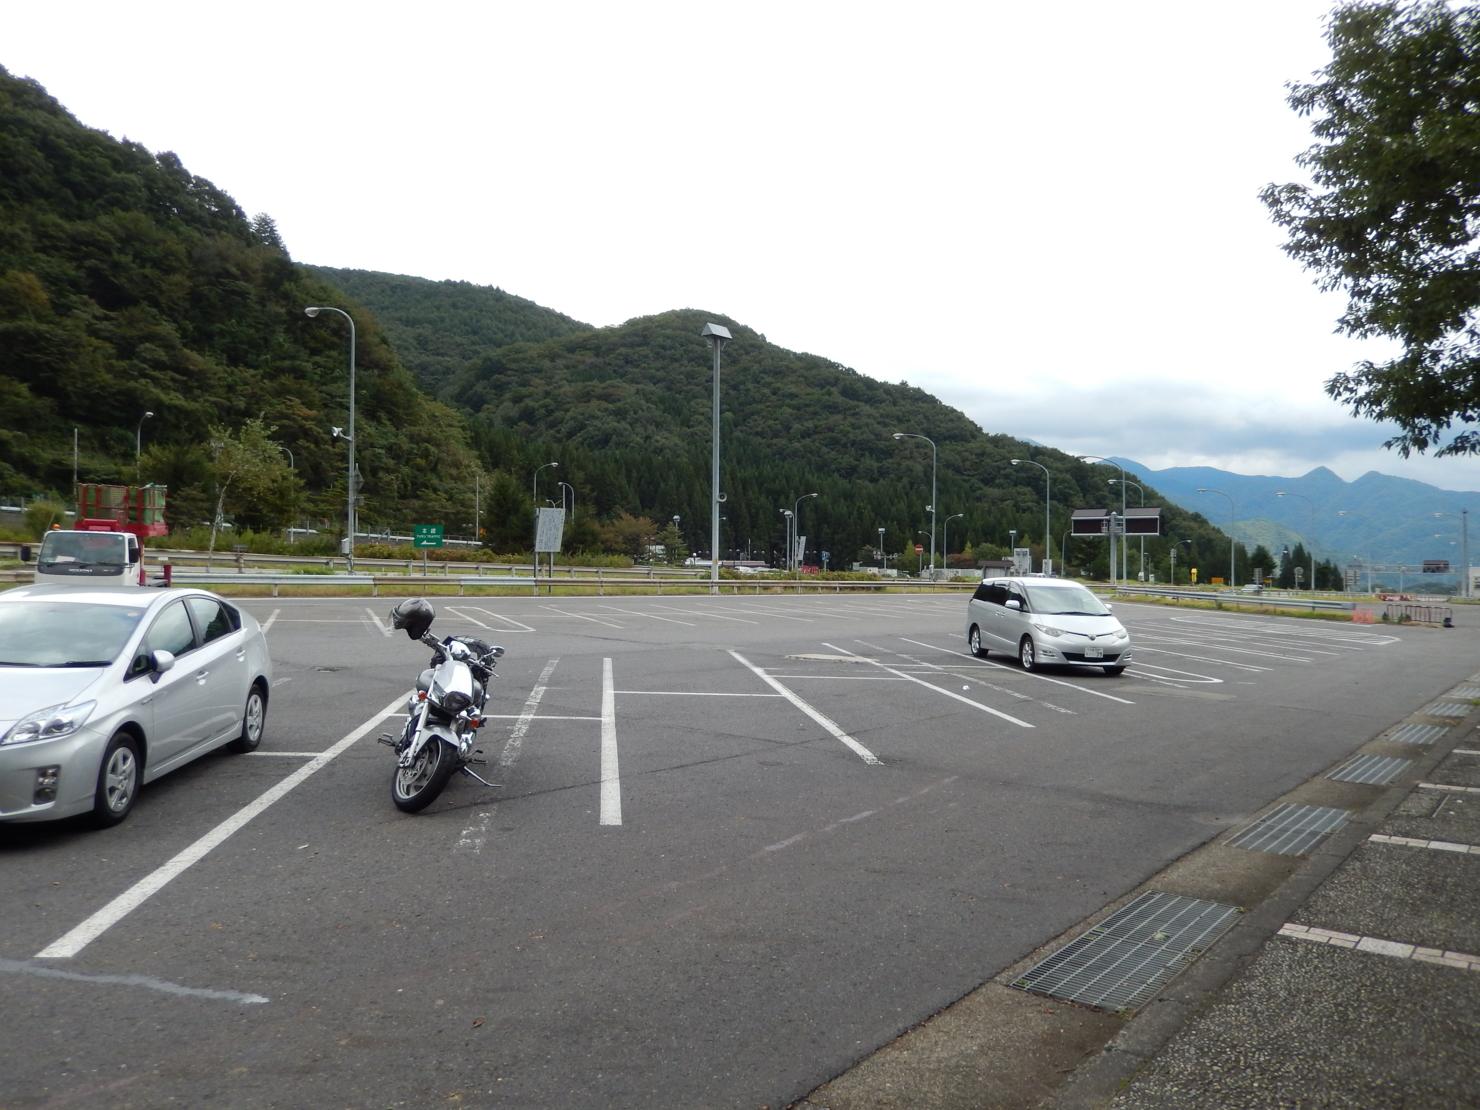 f:id:ToshUeno:20131010115826j:plain